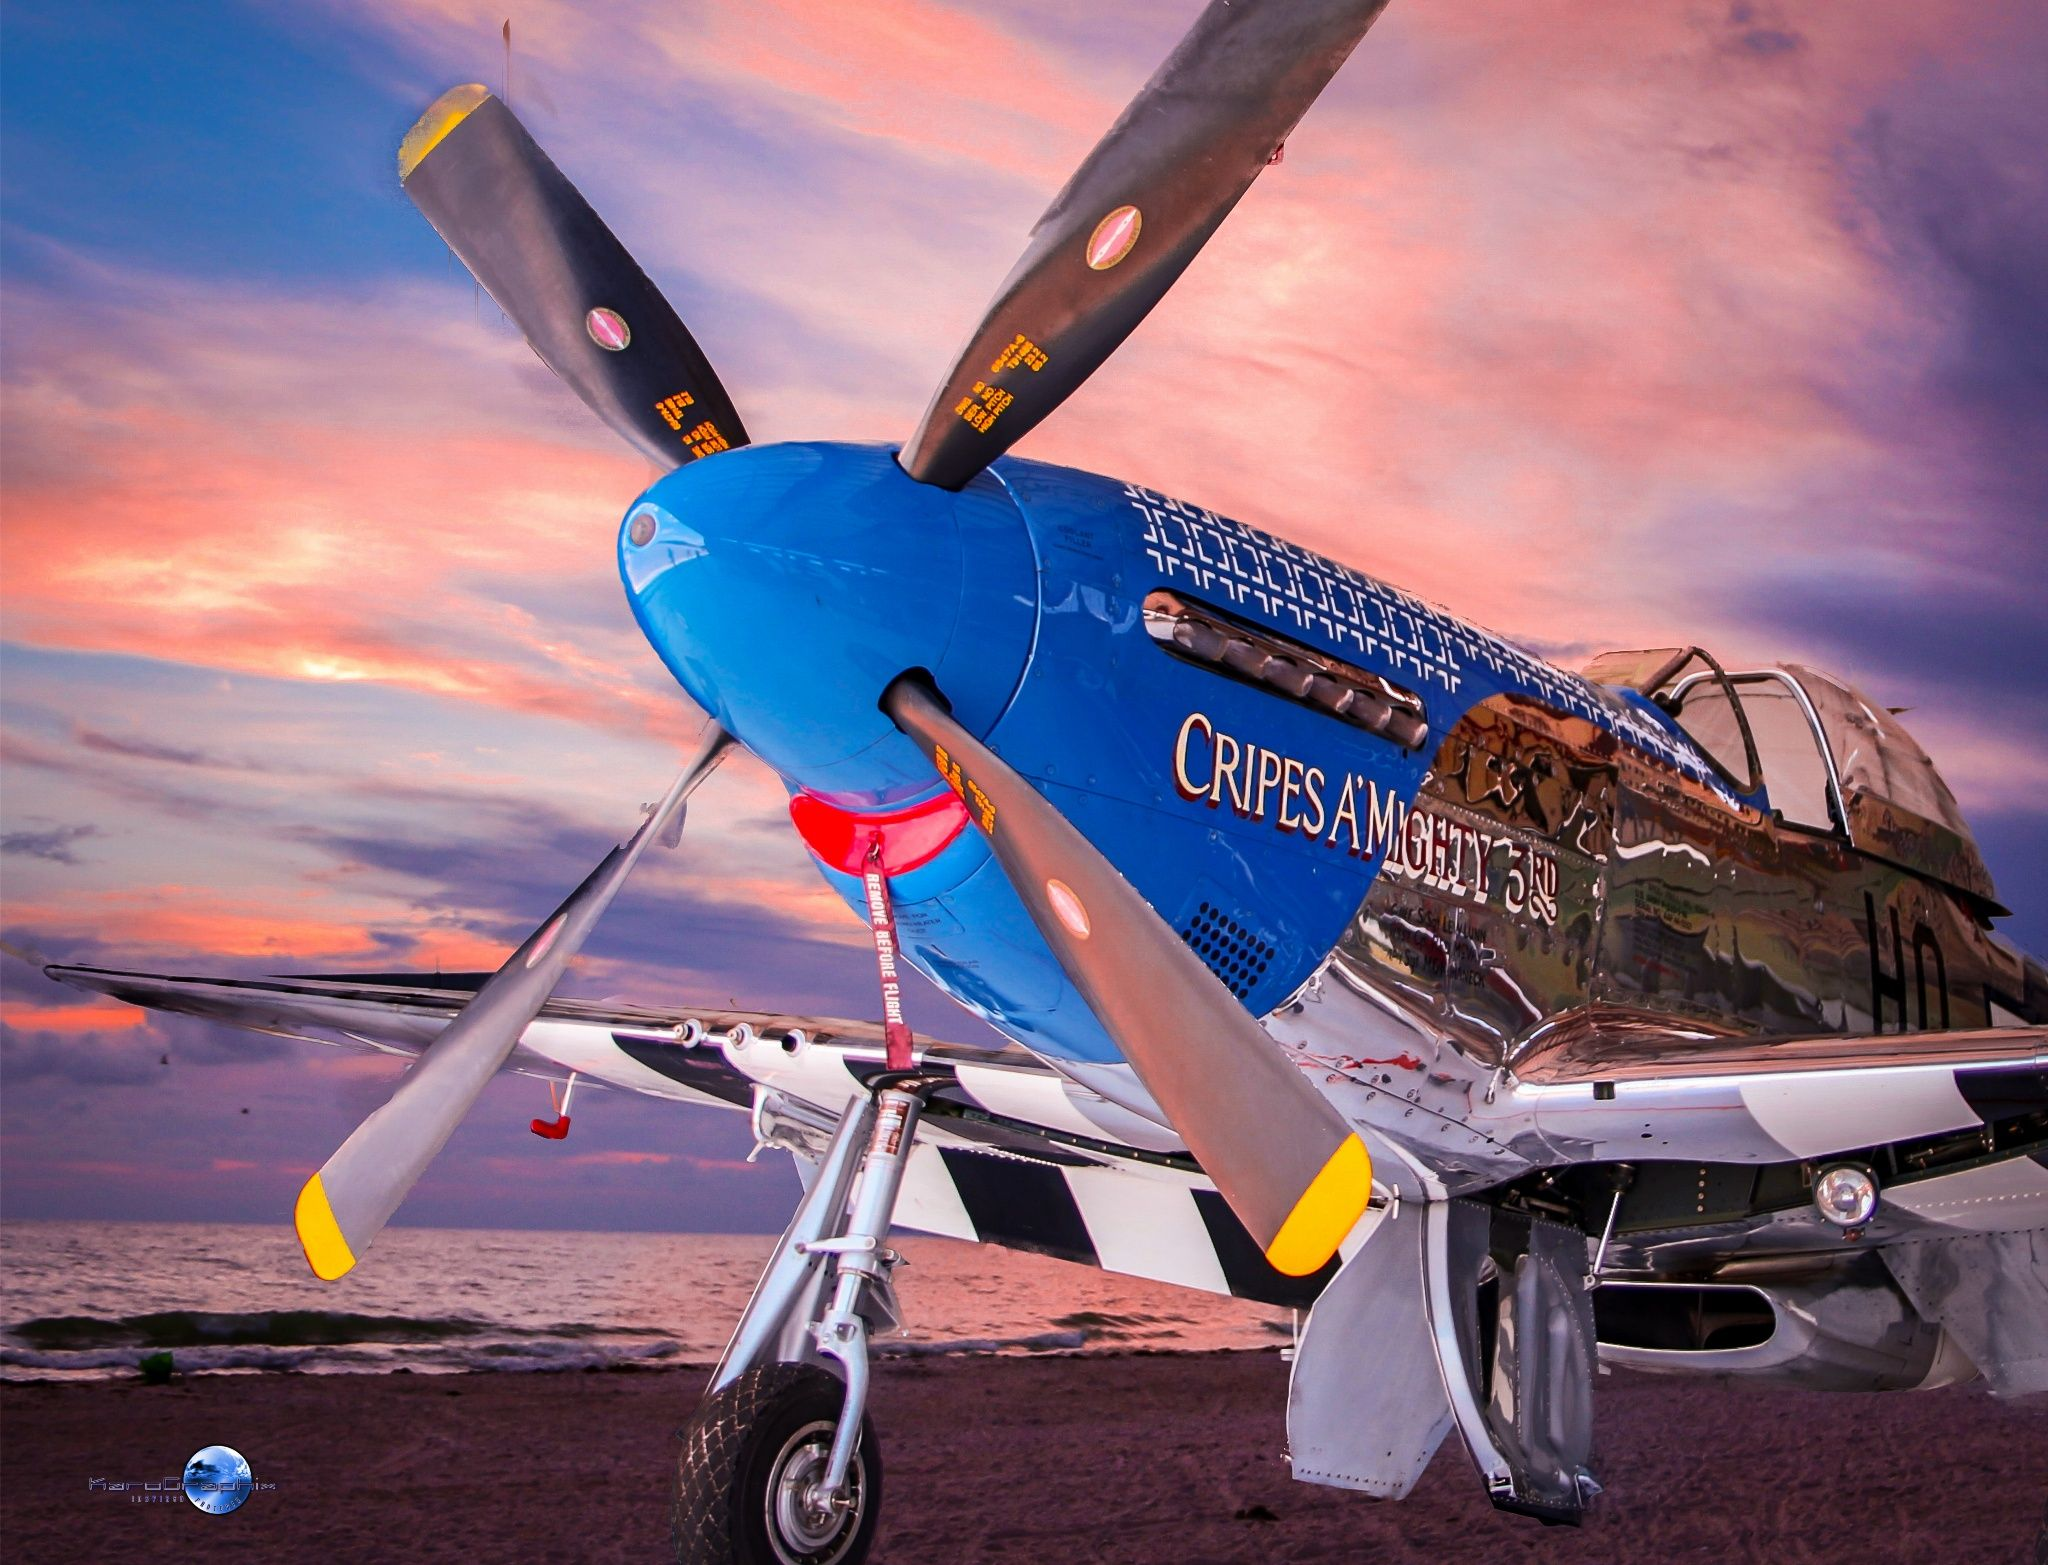 From local air museum near Orlando, FL to Treasure Island